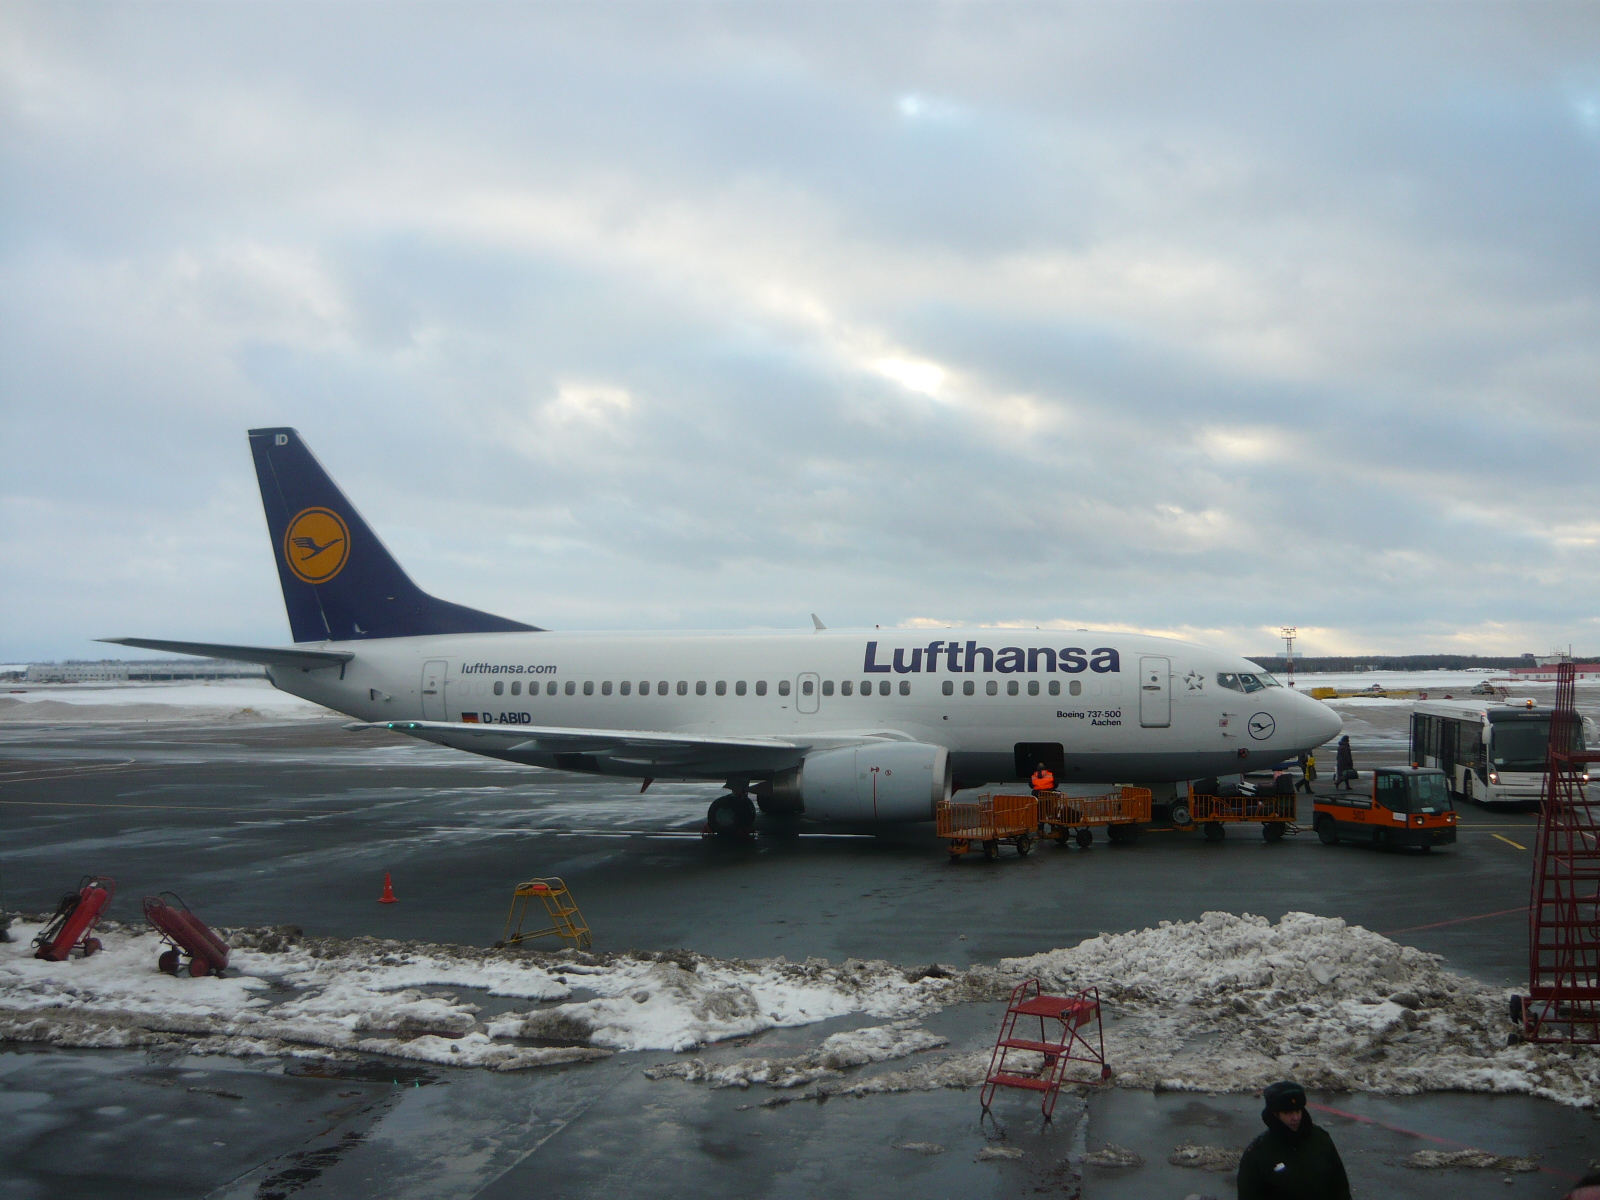 Билеты на самолет из санкт-петербурга люфтганза купить билеты на самолет архангельск нарьян-мар